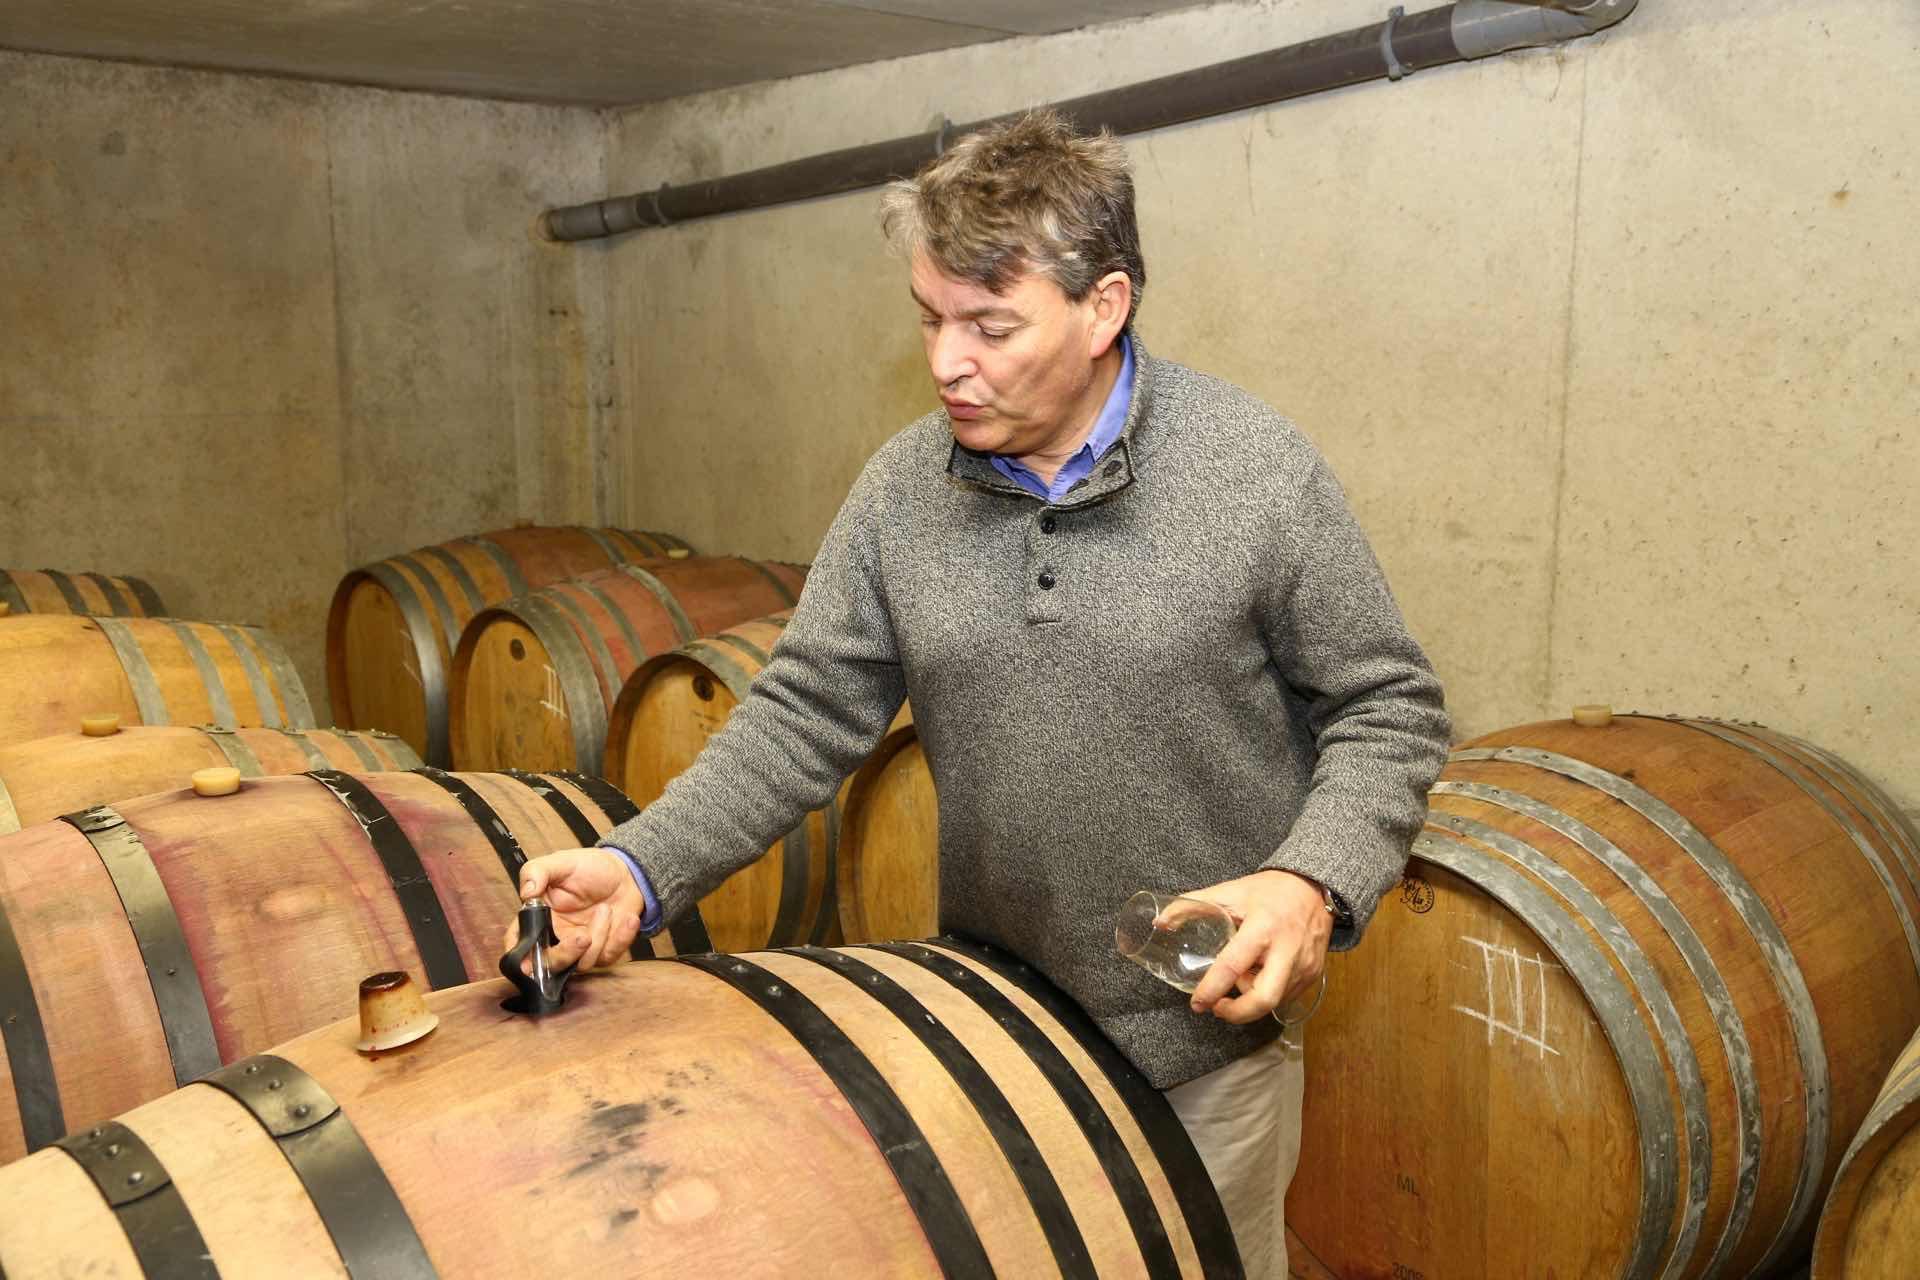 Domaine Guy Farge - アペロ ワインバー / apéro WINEBAR - vins et petits plats français - Minami Aoyama Tokyo